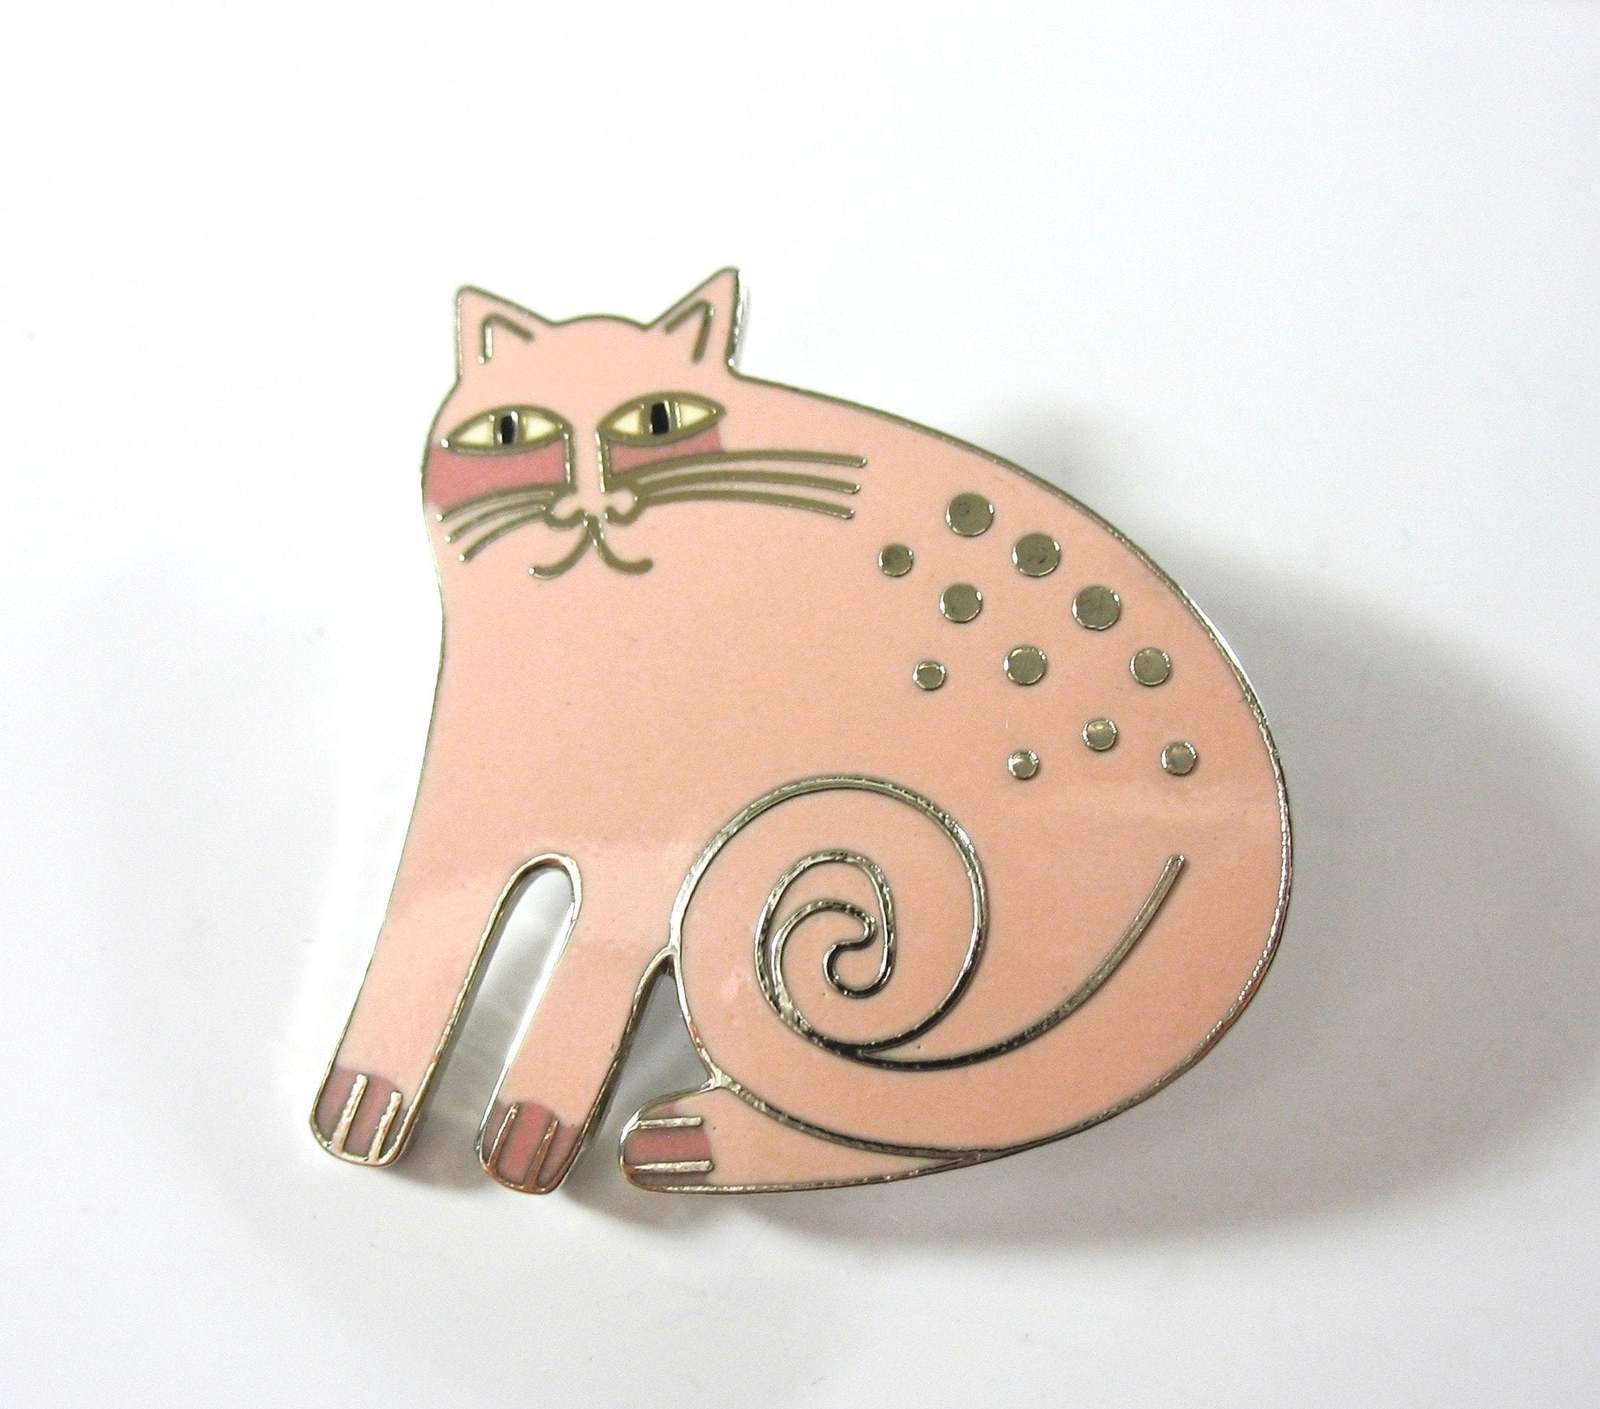 LAUREL BURCH Cat Pin, Cat Earrings, Set, Keshire Cat, Pink Kitty, Silver, Collec